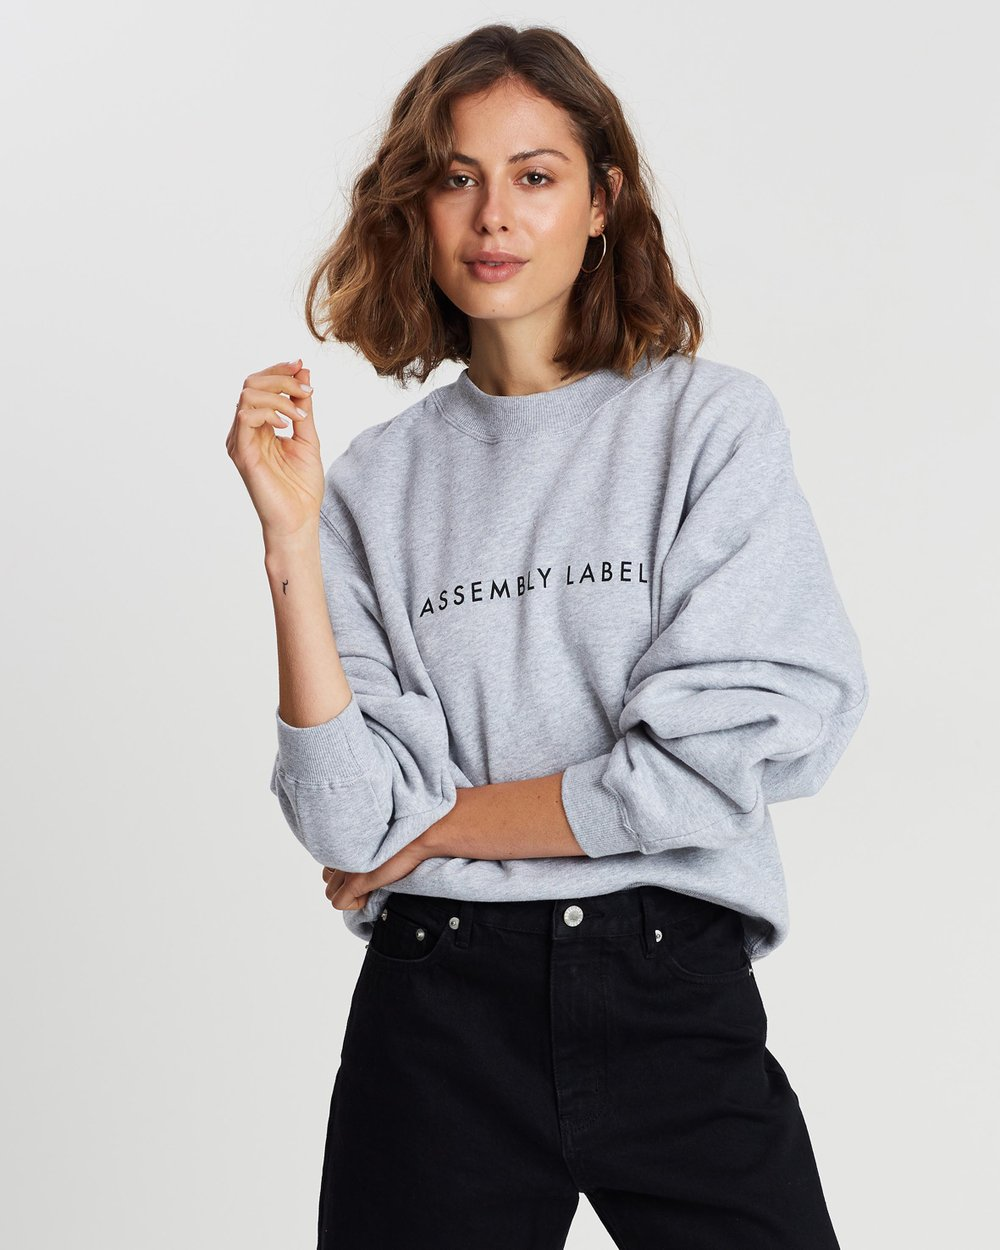 Assembly Label Logo Fleece Sweater